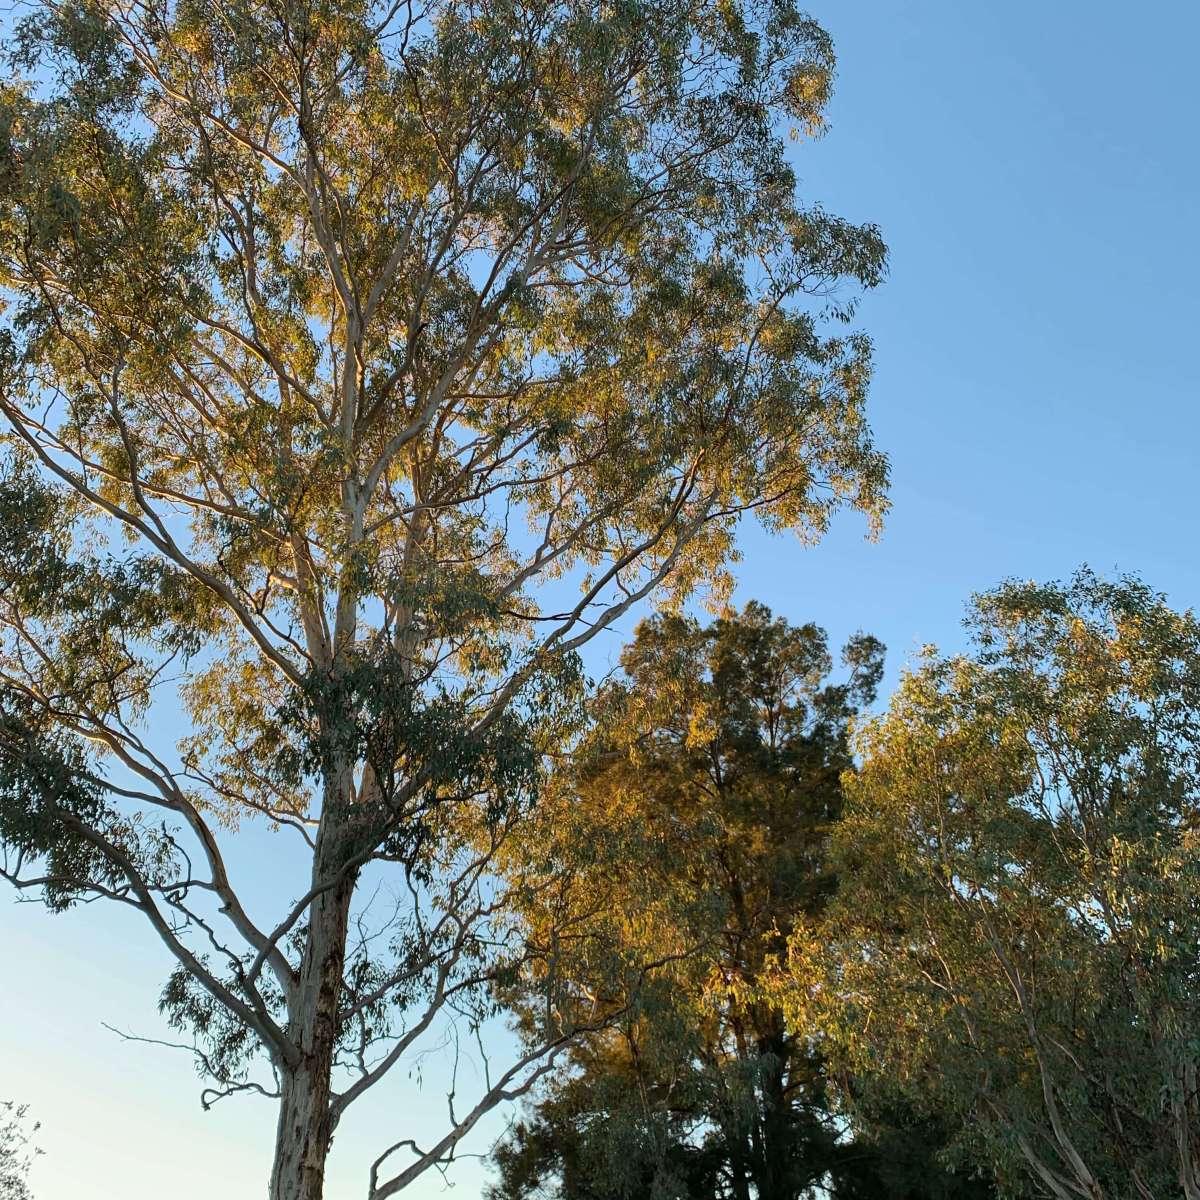 Sunkissed trees near Lake Ginninderra, Canberra